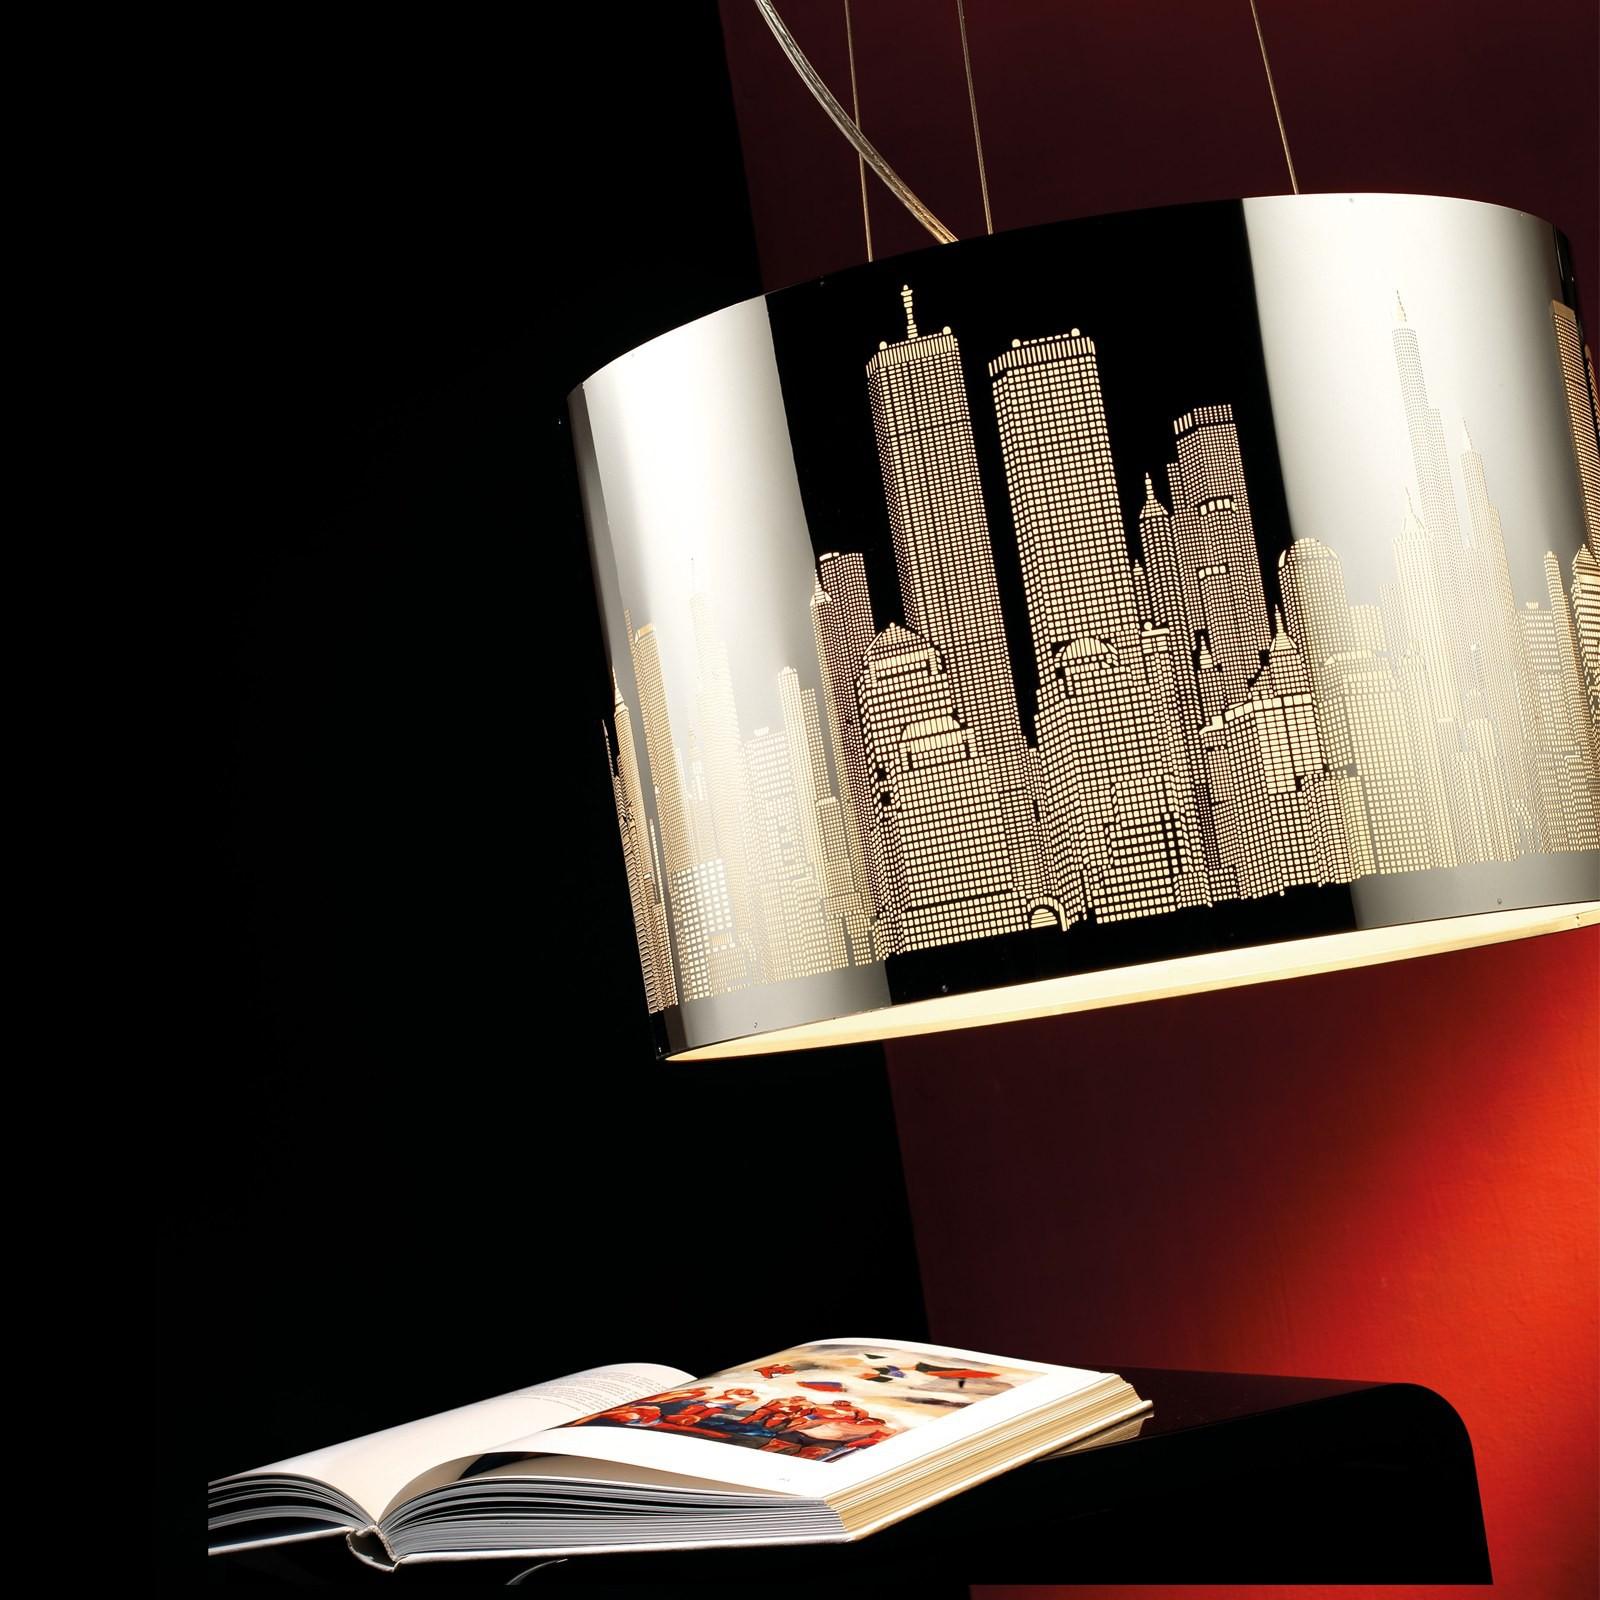 Lampadario lampada da soffitto led plafoniera a for Lampadario sospensione leroy merlin